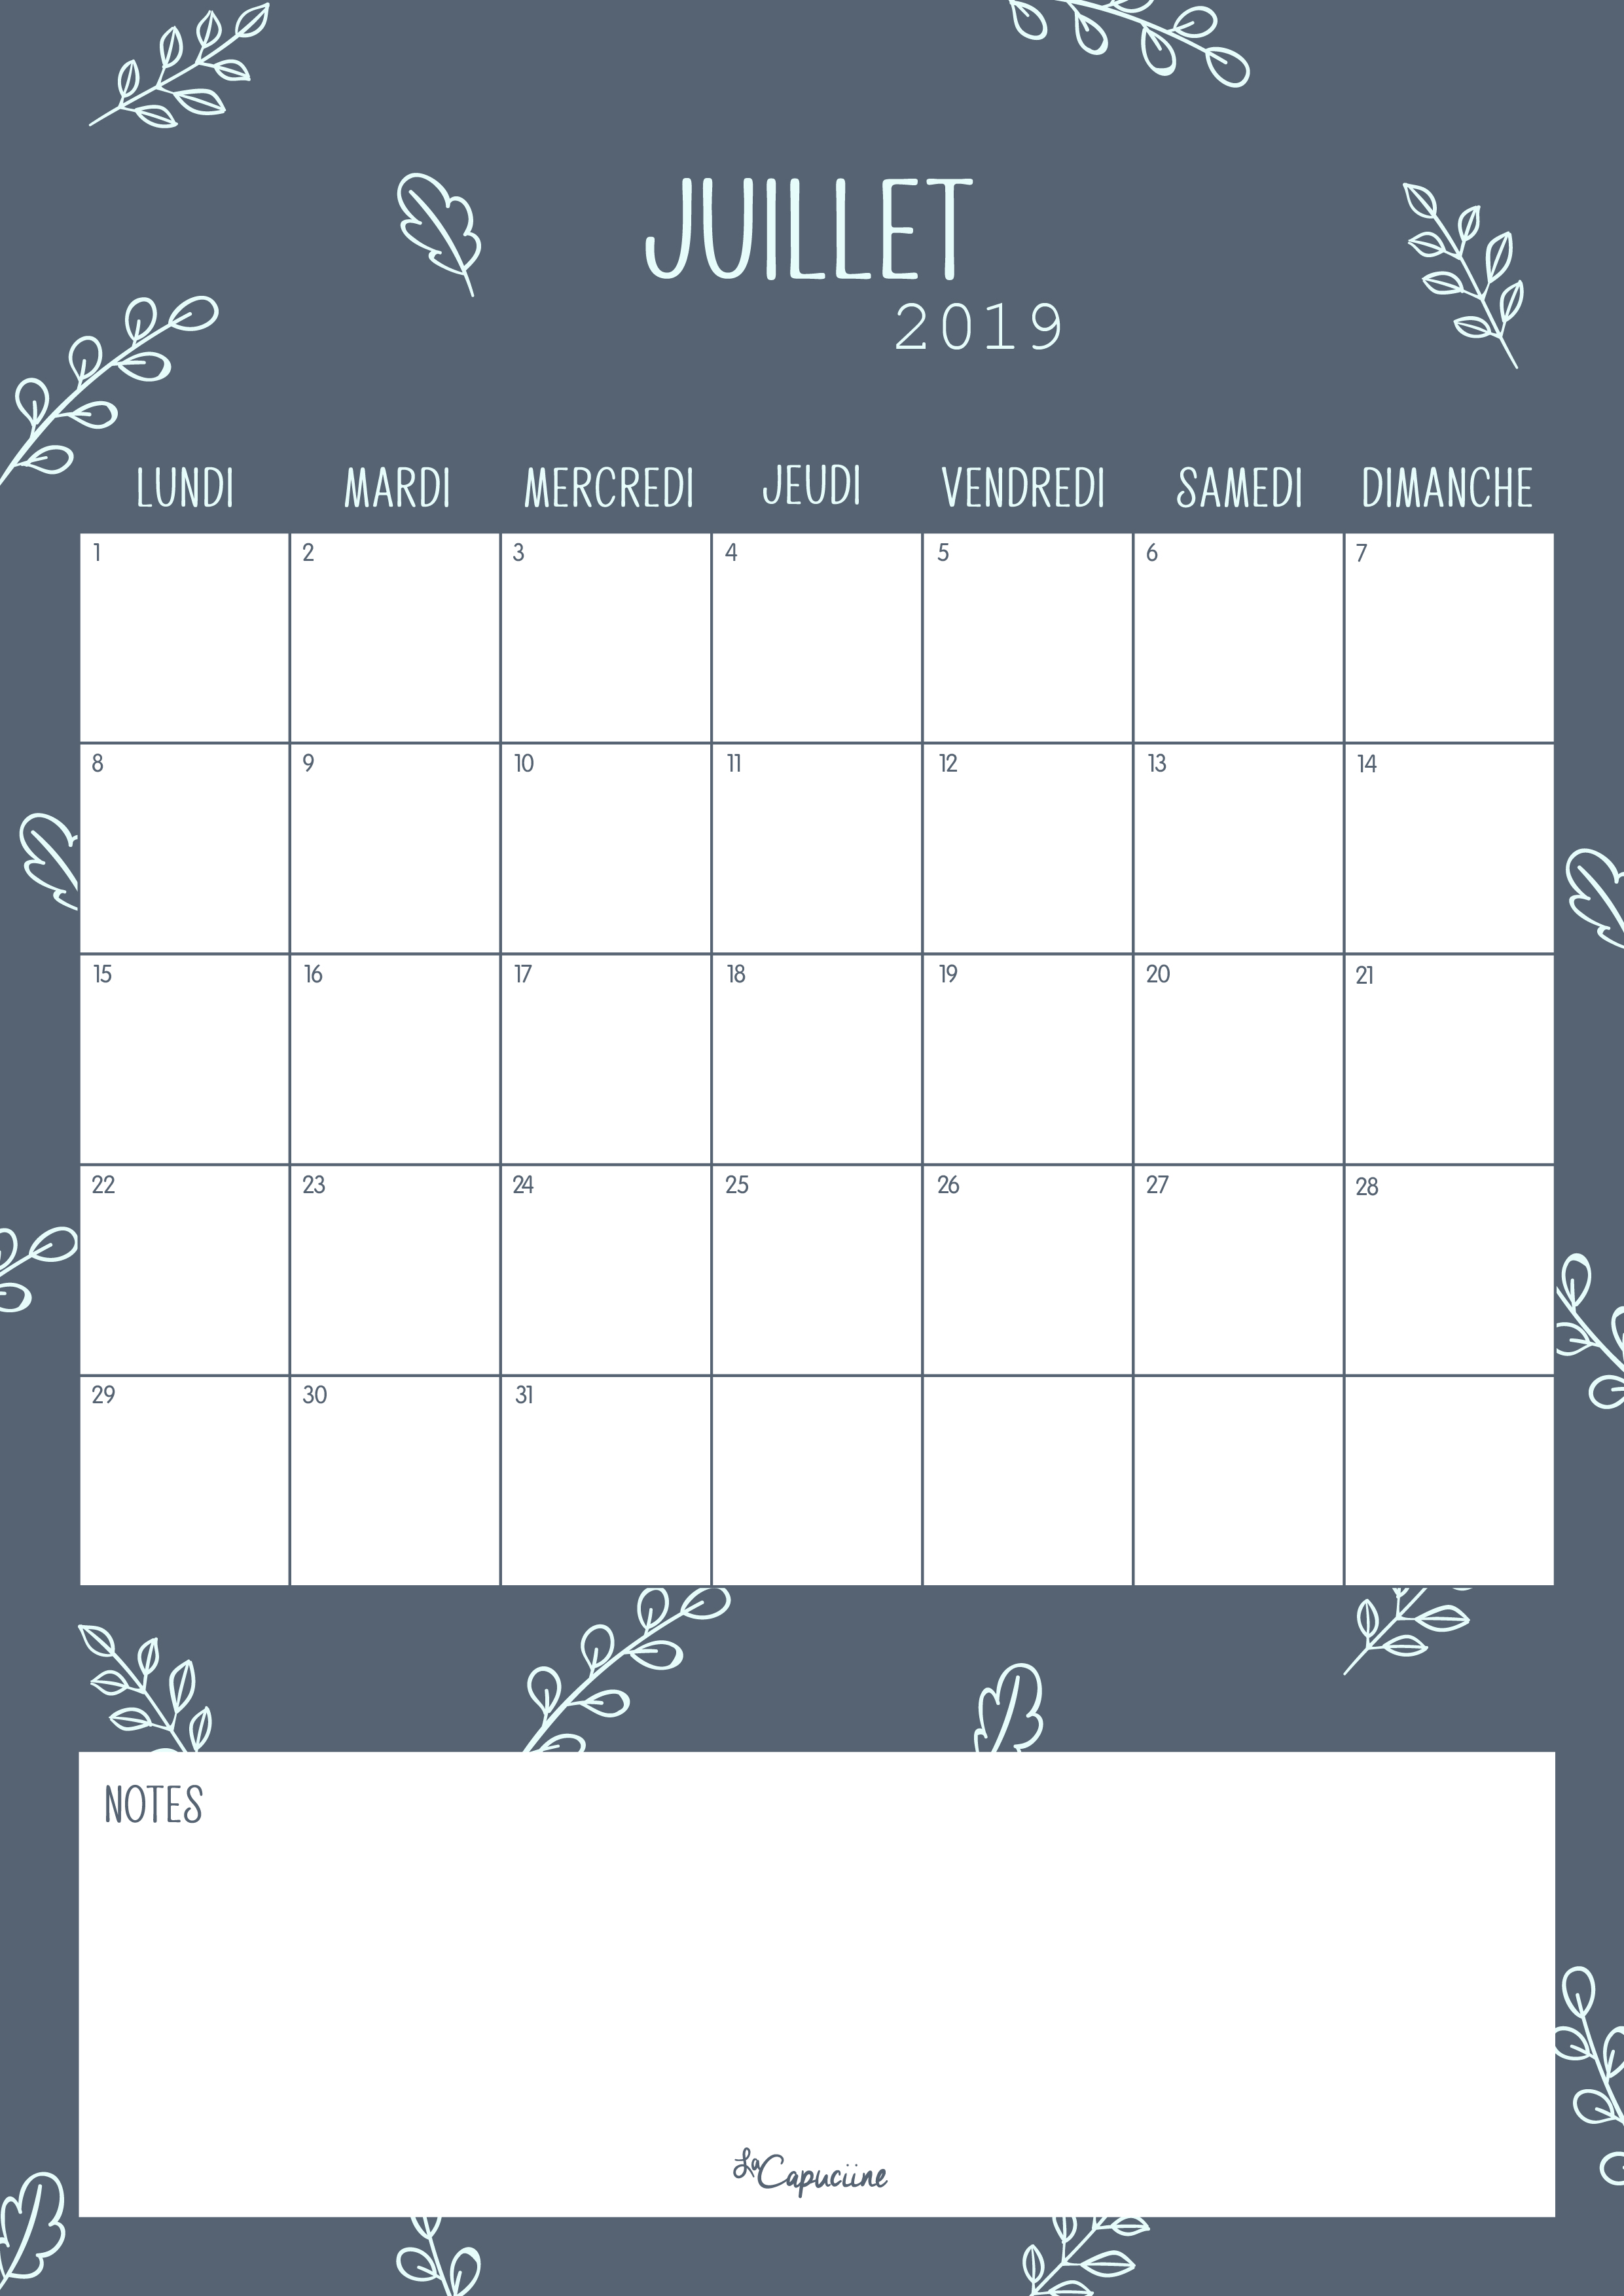 Calendrier A Imprimer Juillet 2019.Calendrier Juillet 2019 La Capuciine